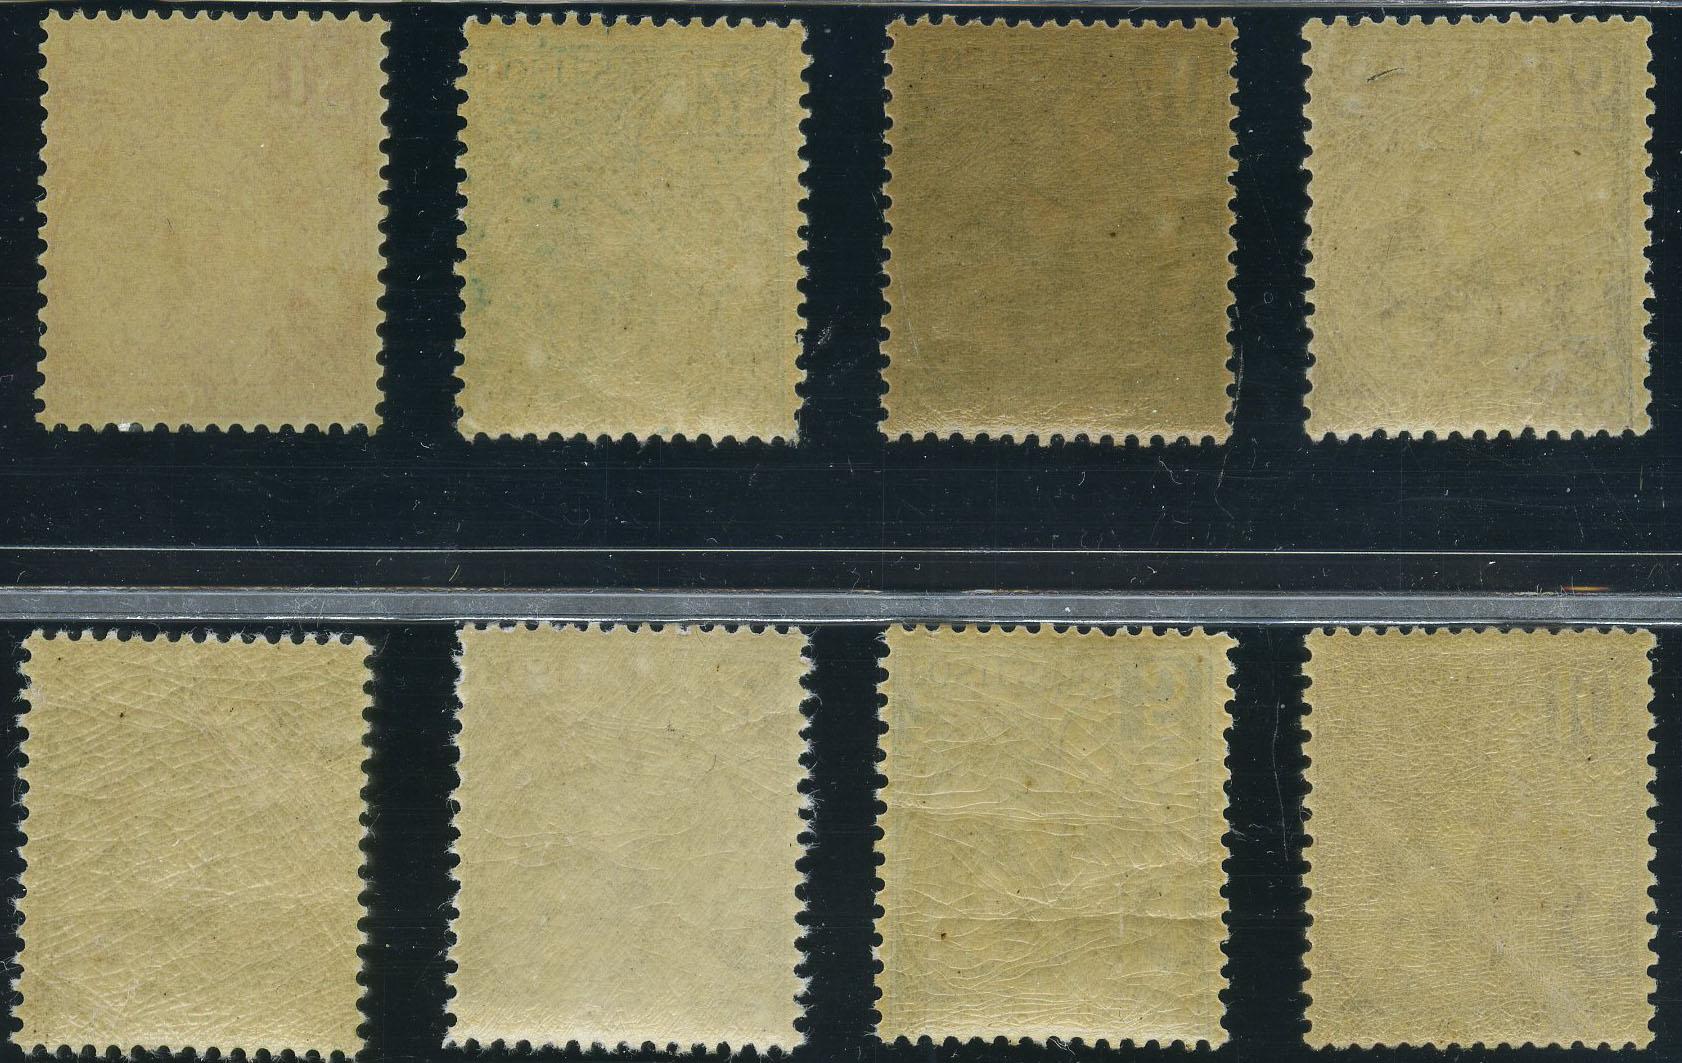 Lot 2344 - Monaco (Michel)  -  Skanfil Auksjoner AS  Public auction 211